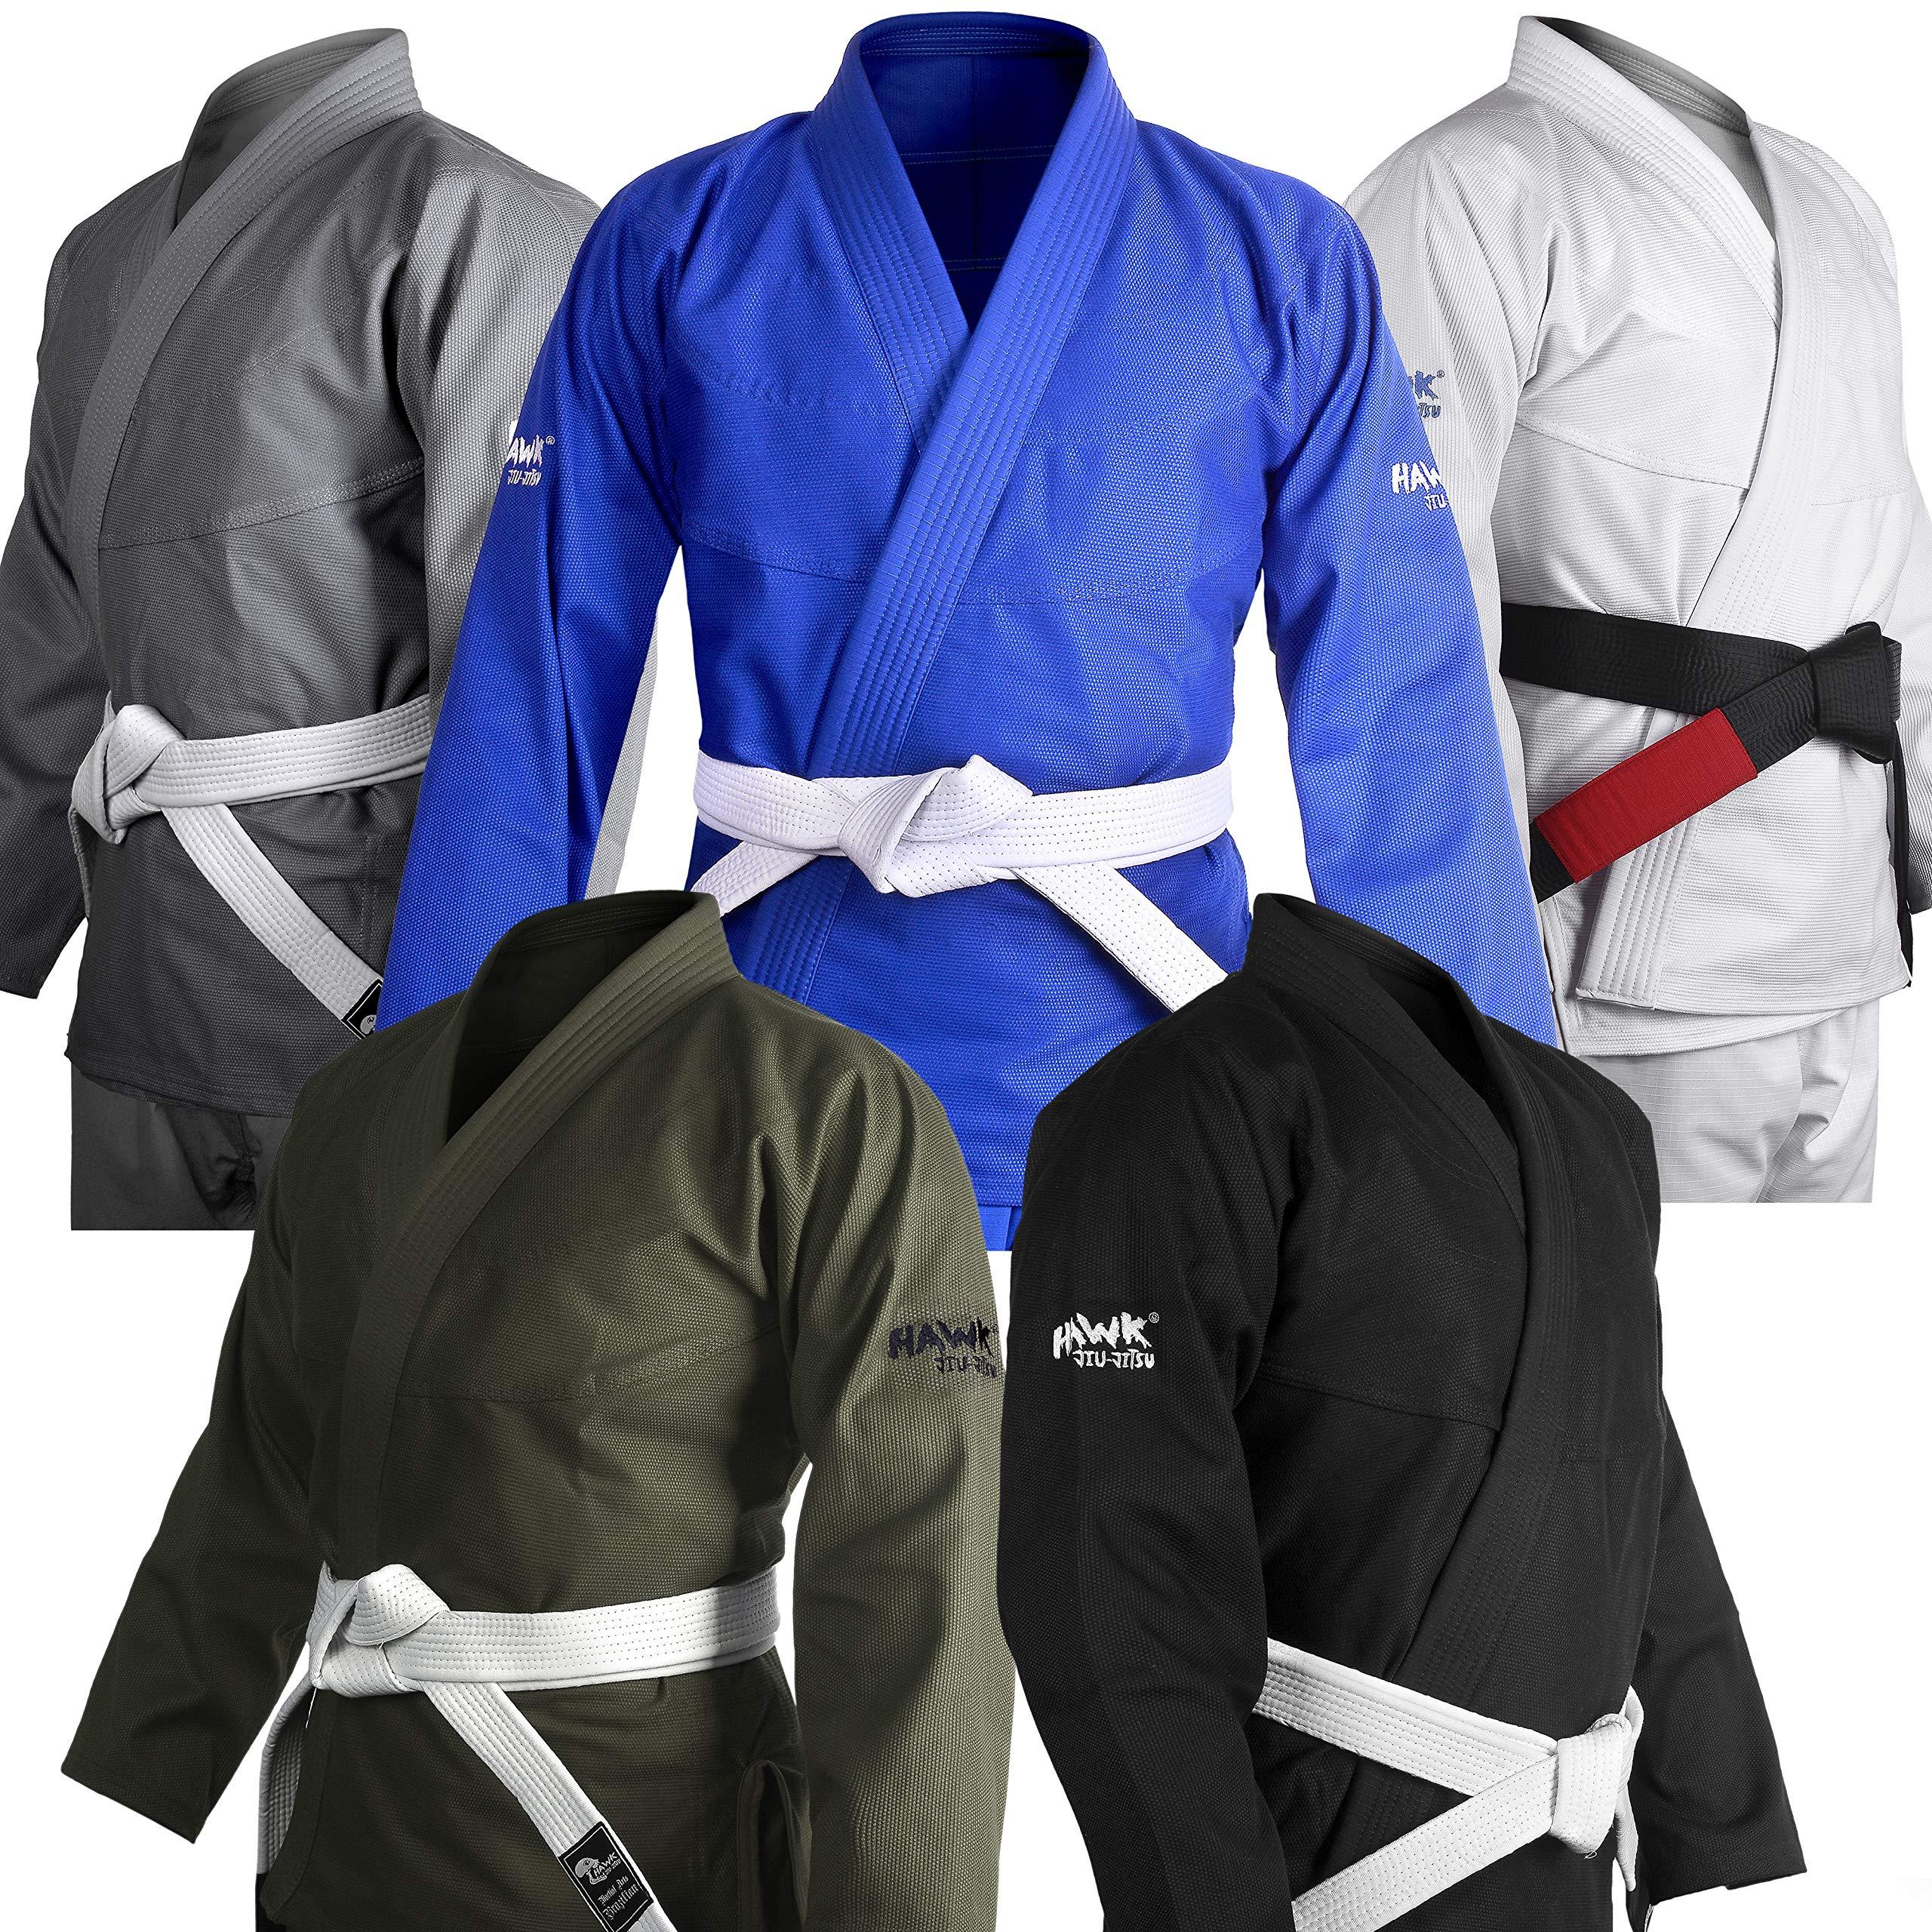 Hawk Sports MMA BJJ Unisex Cross Training Gym Boxing Grappling Kickboxing...